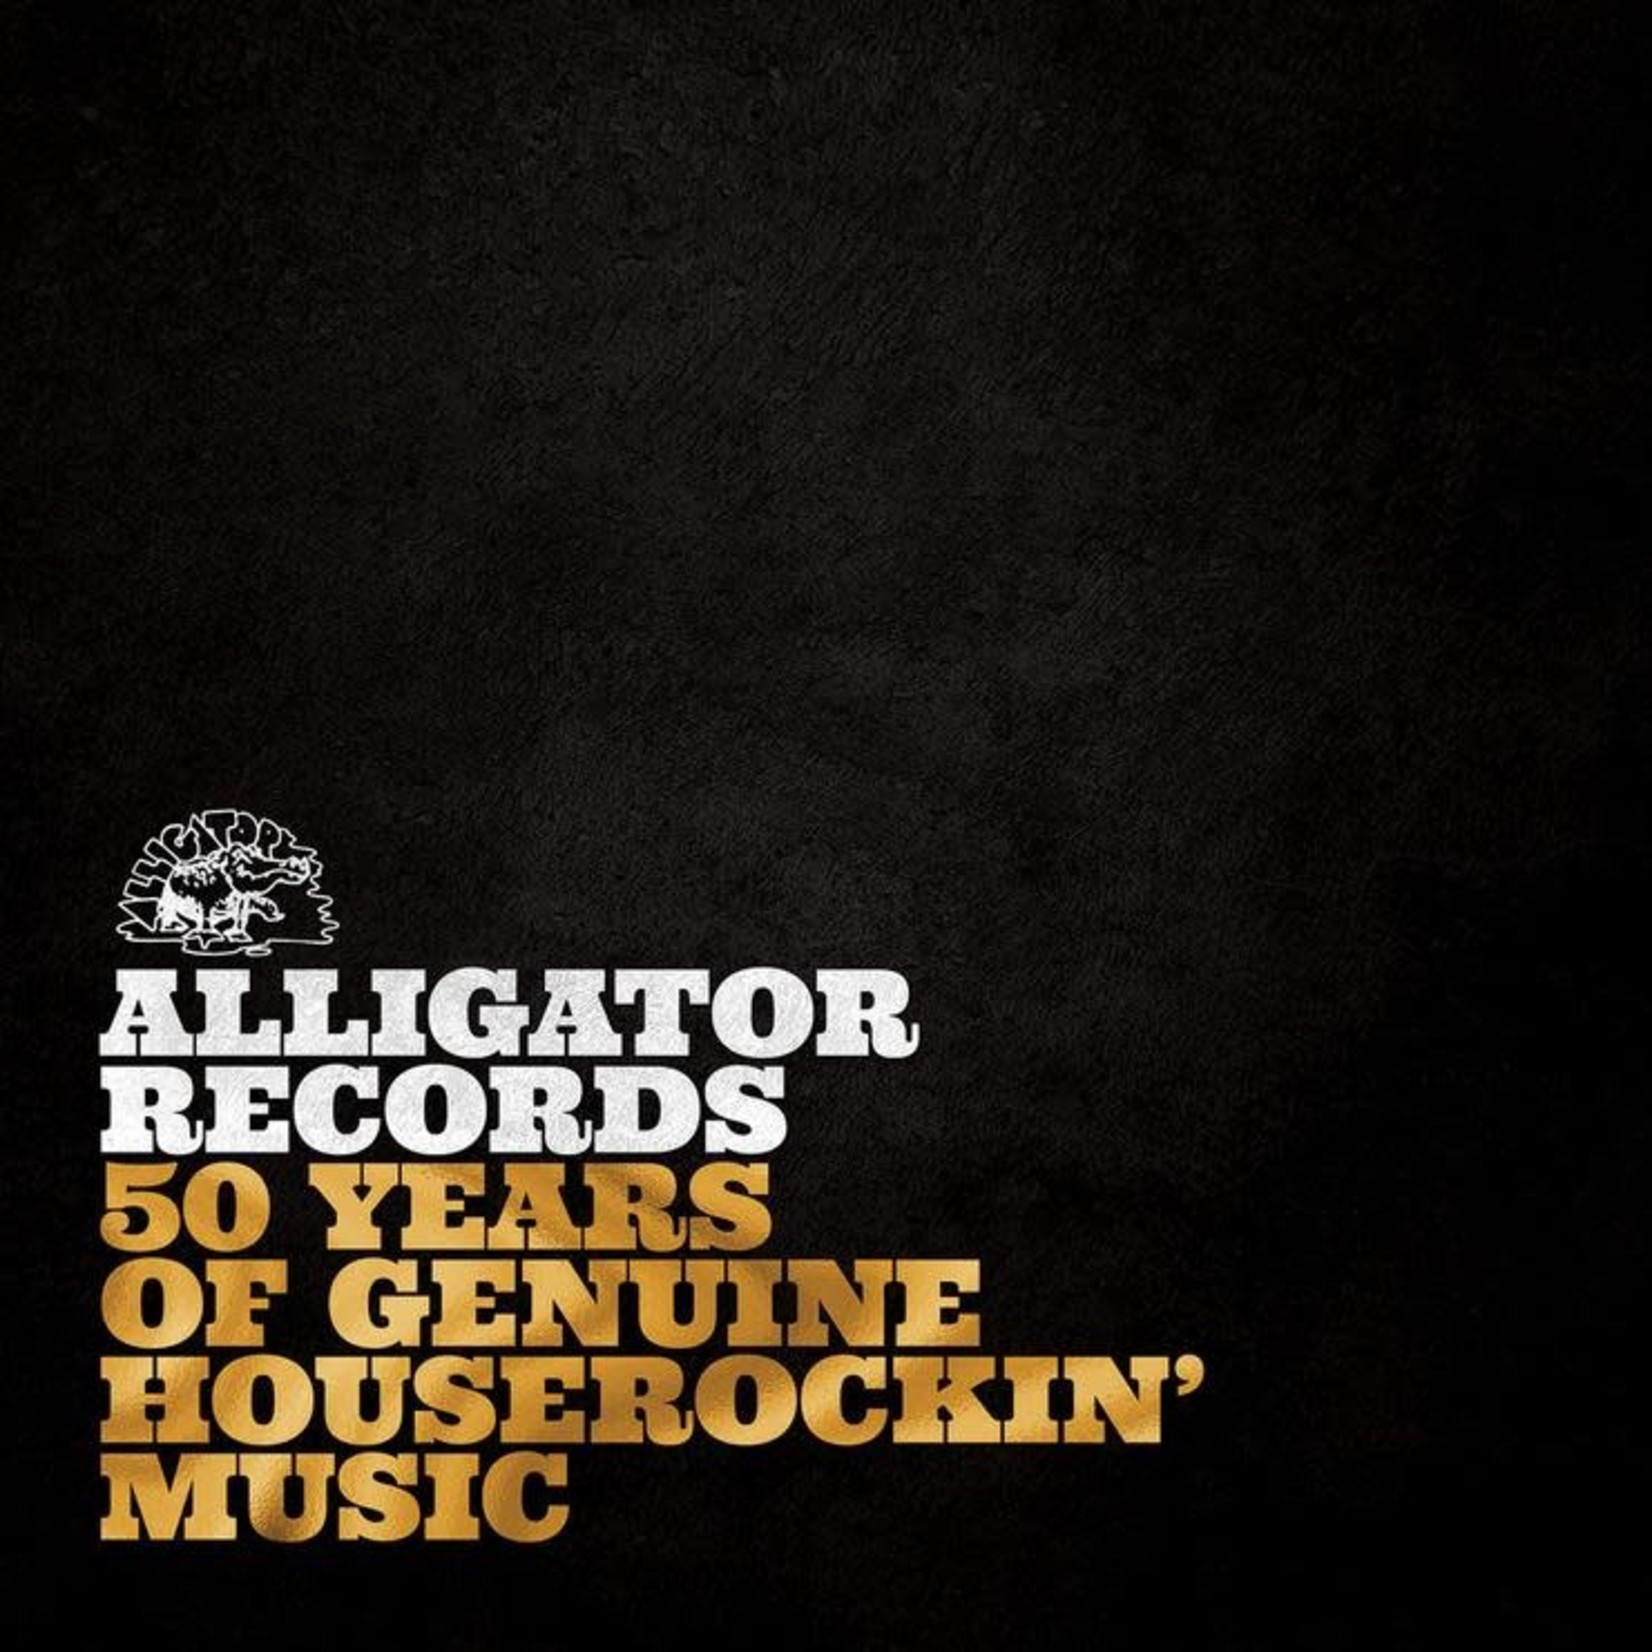 VARIOUS ARTISTS ALLIGATOR RECORDS - 50 YEARS OF GENUINE HOUSEROCKIN' MUSIC  LP